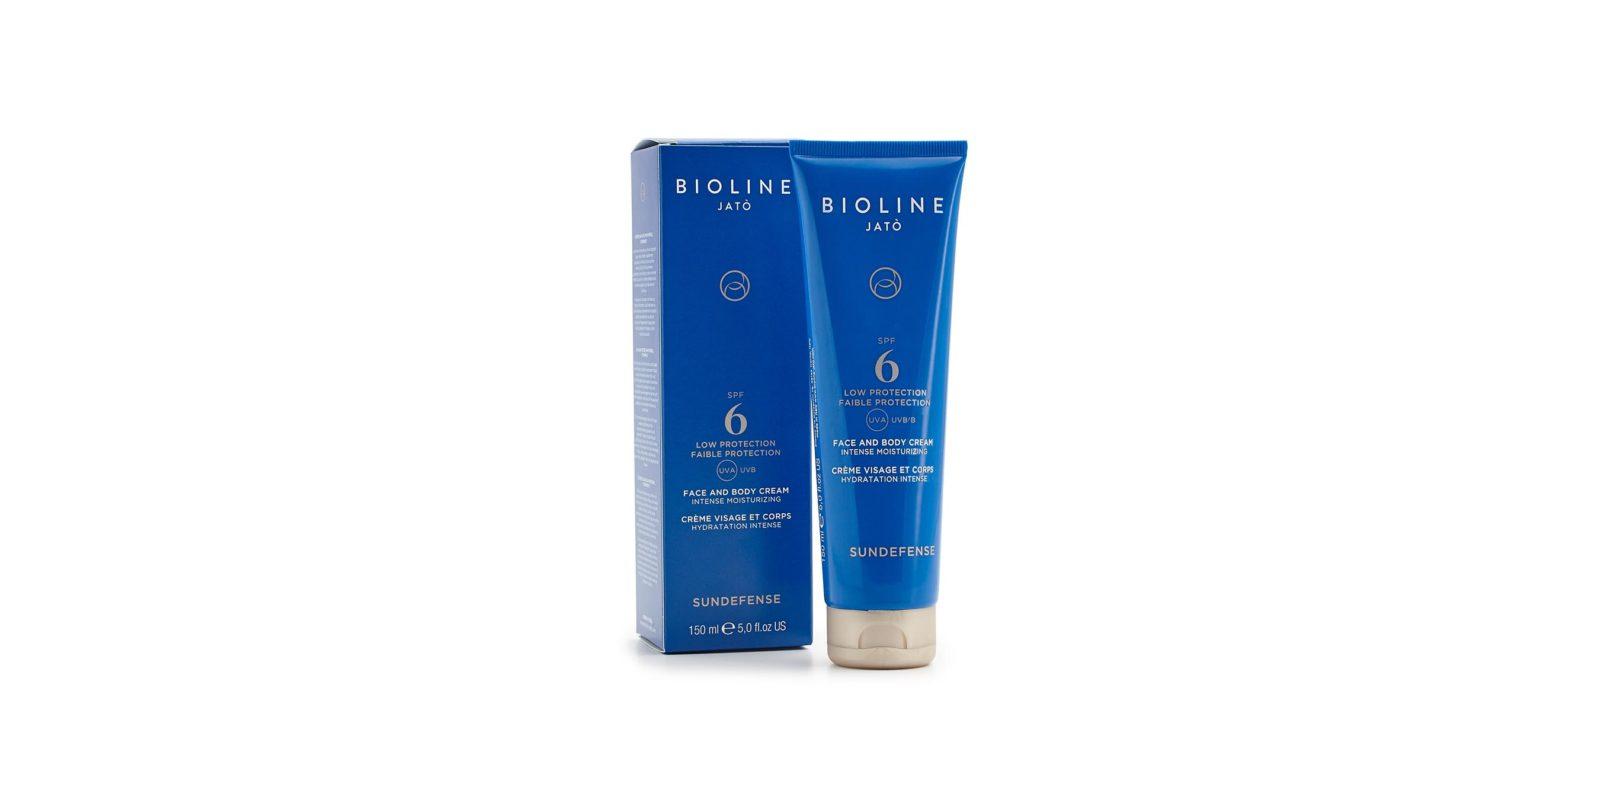 Bioline Jatò Sundefense Low Protection Cream